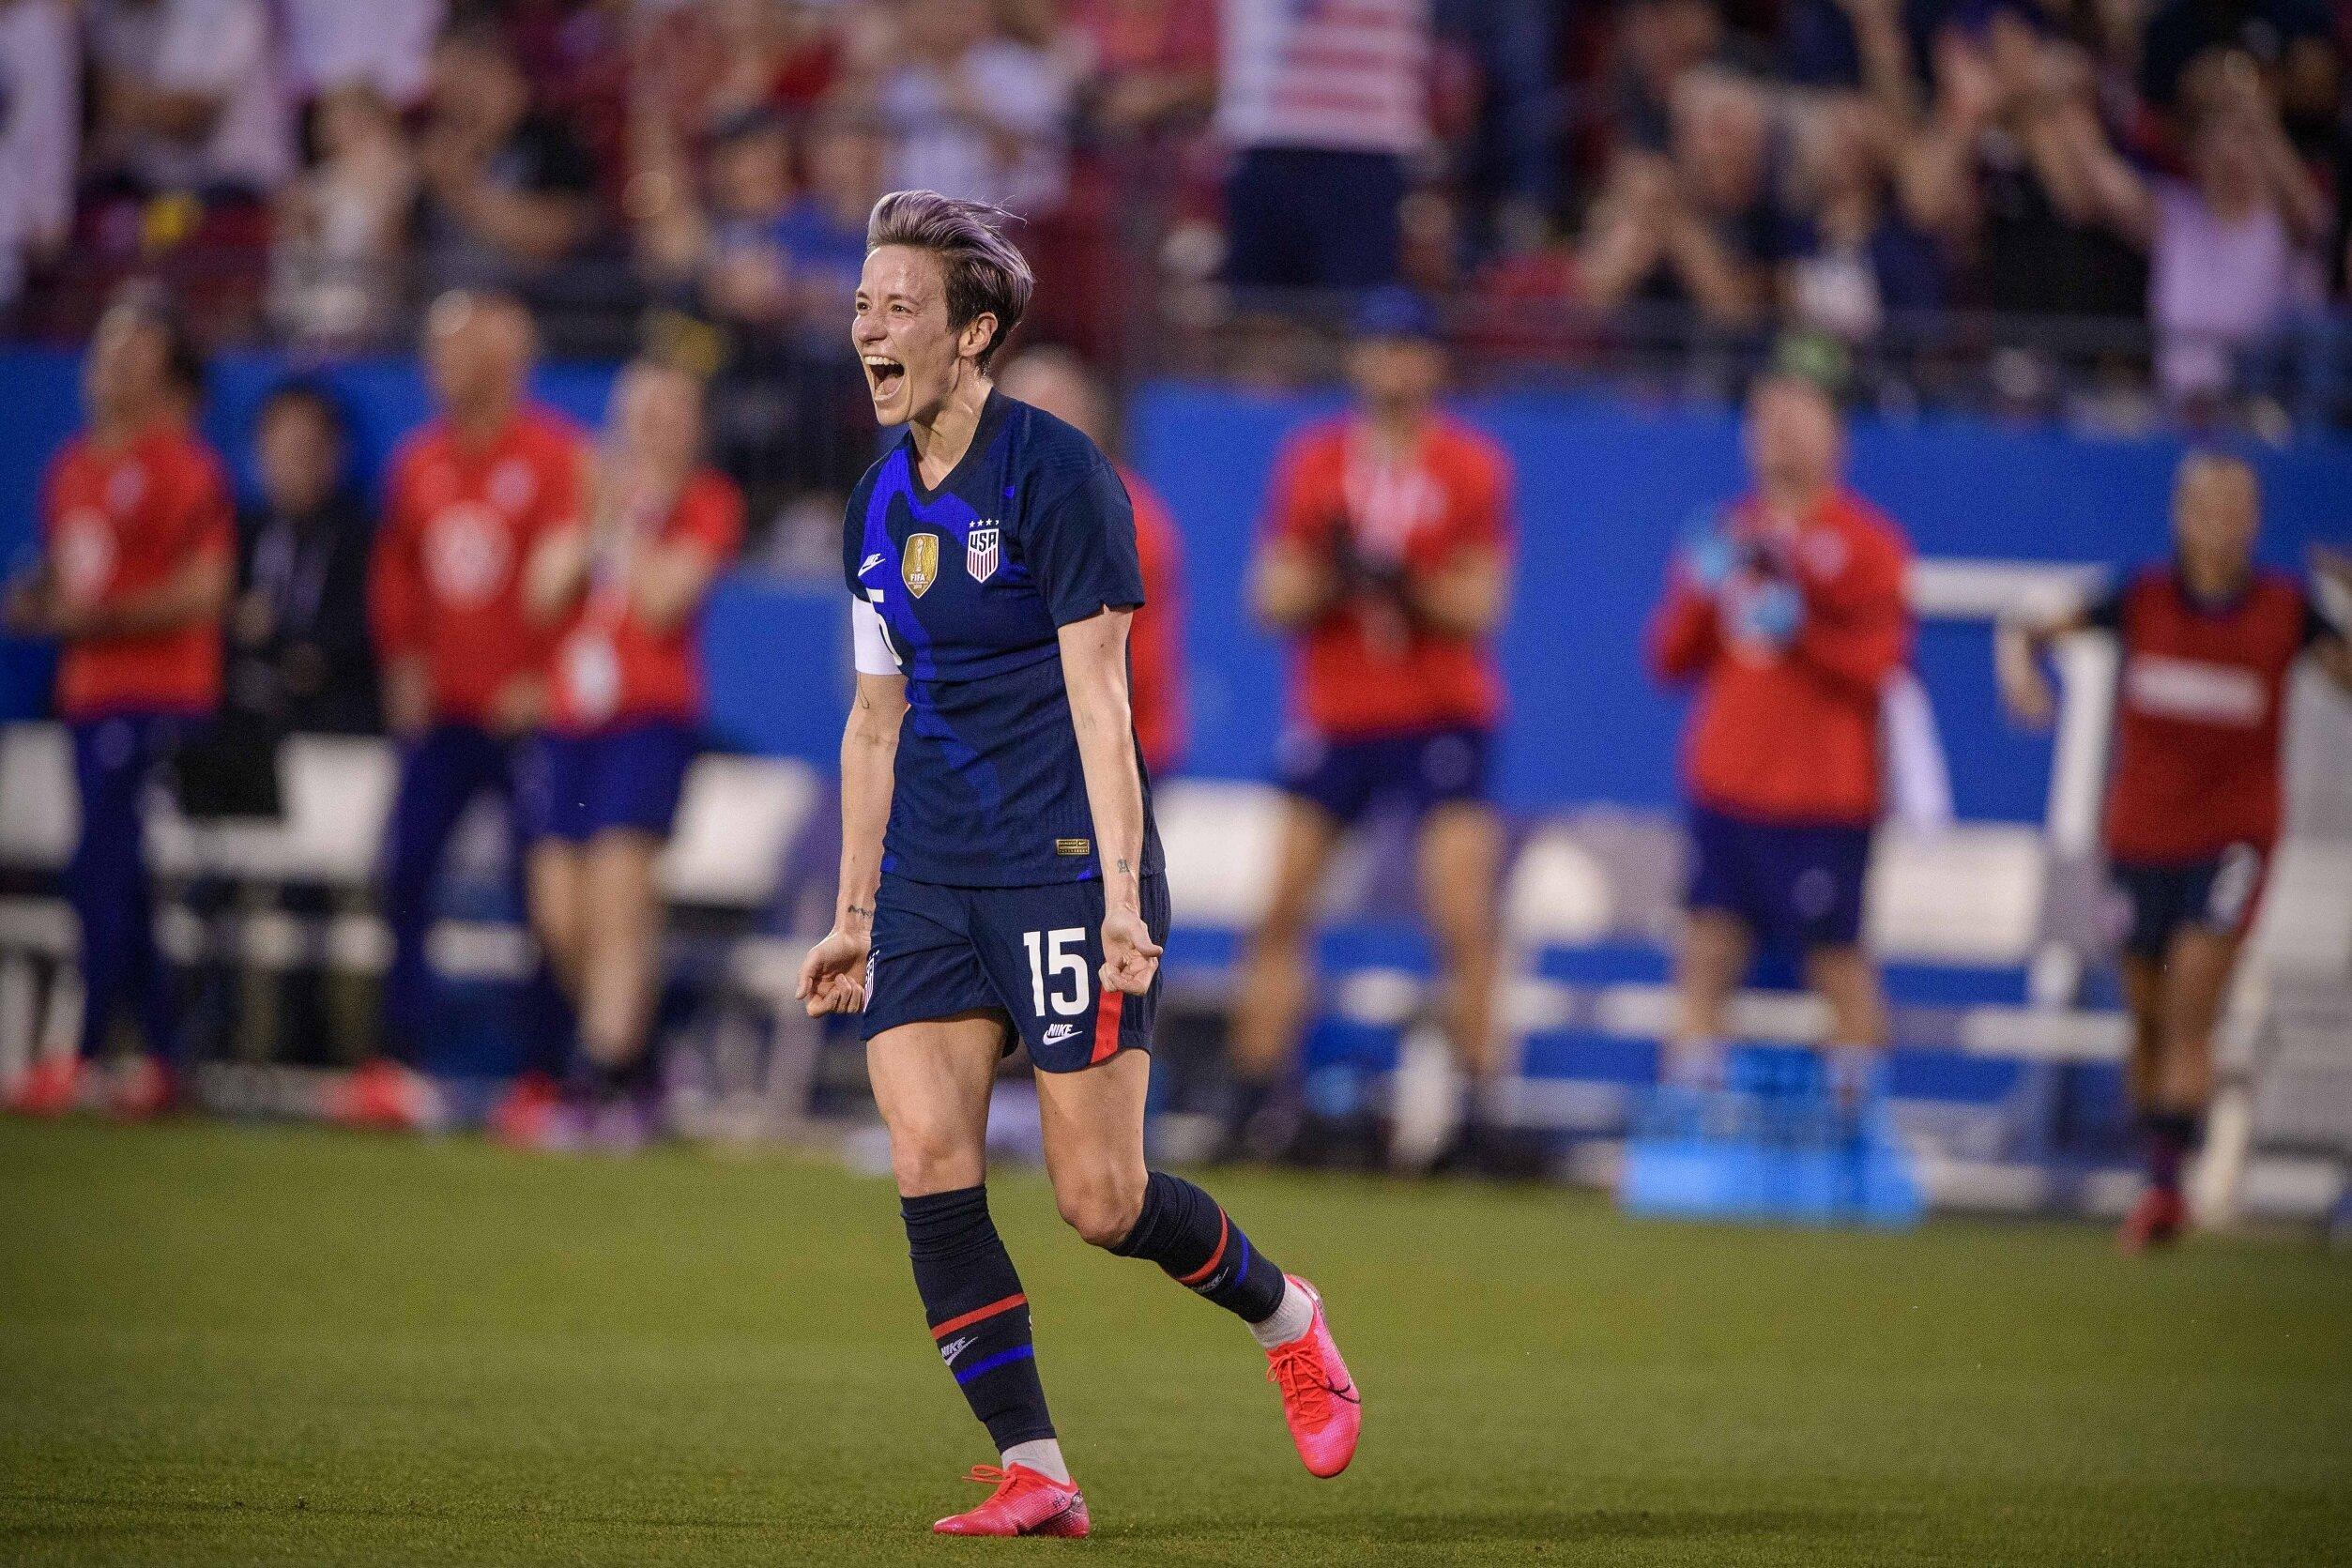 Team USA Women's Soccer Tokyo Olympics